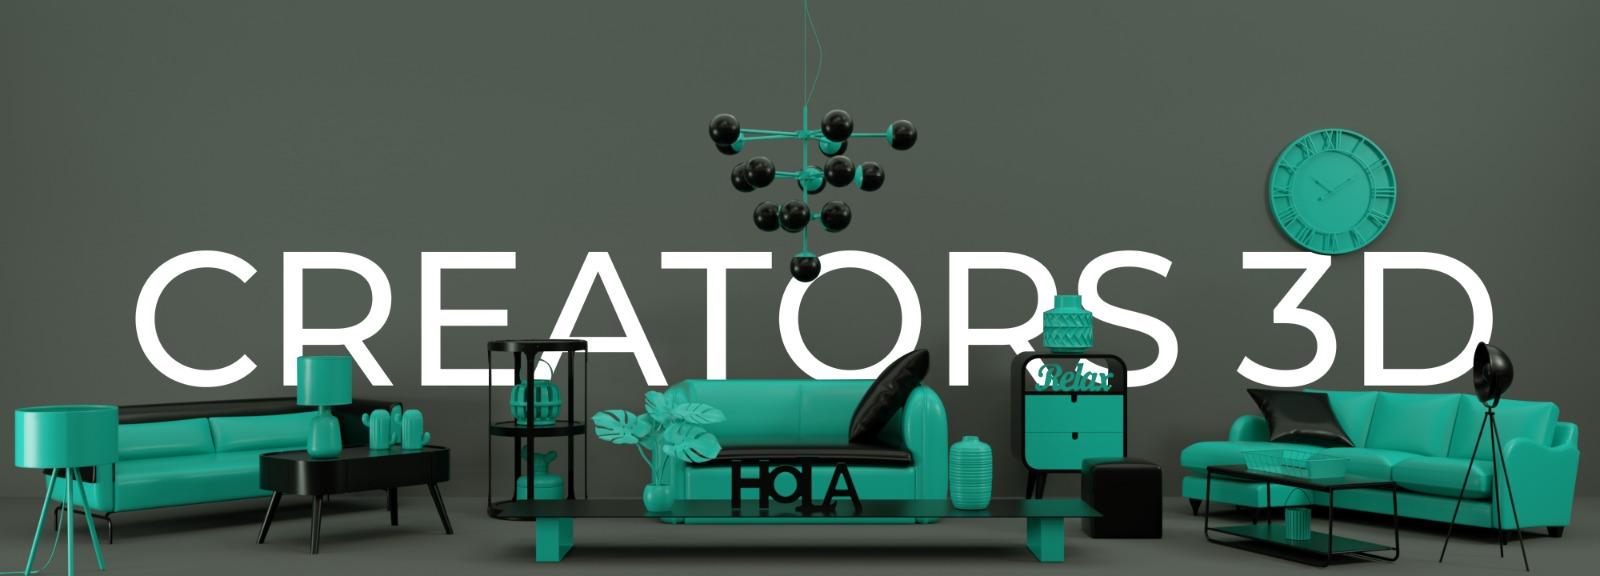 Creators 3D | Online 3D Viewer